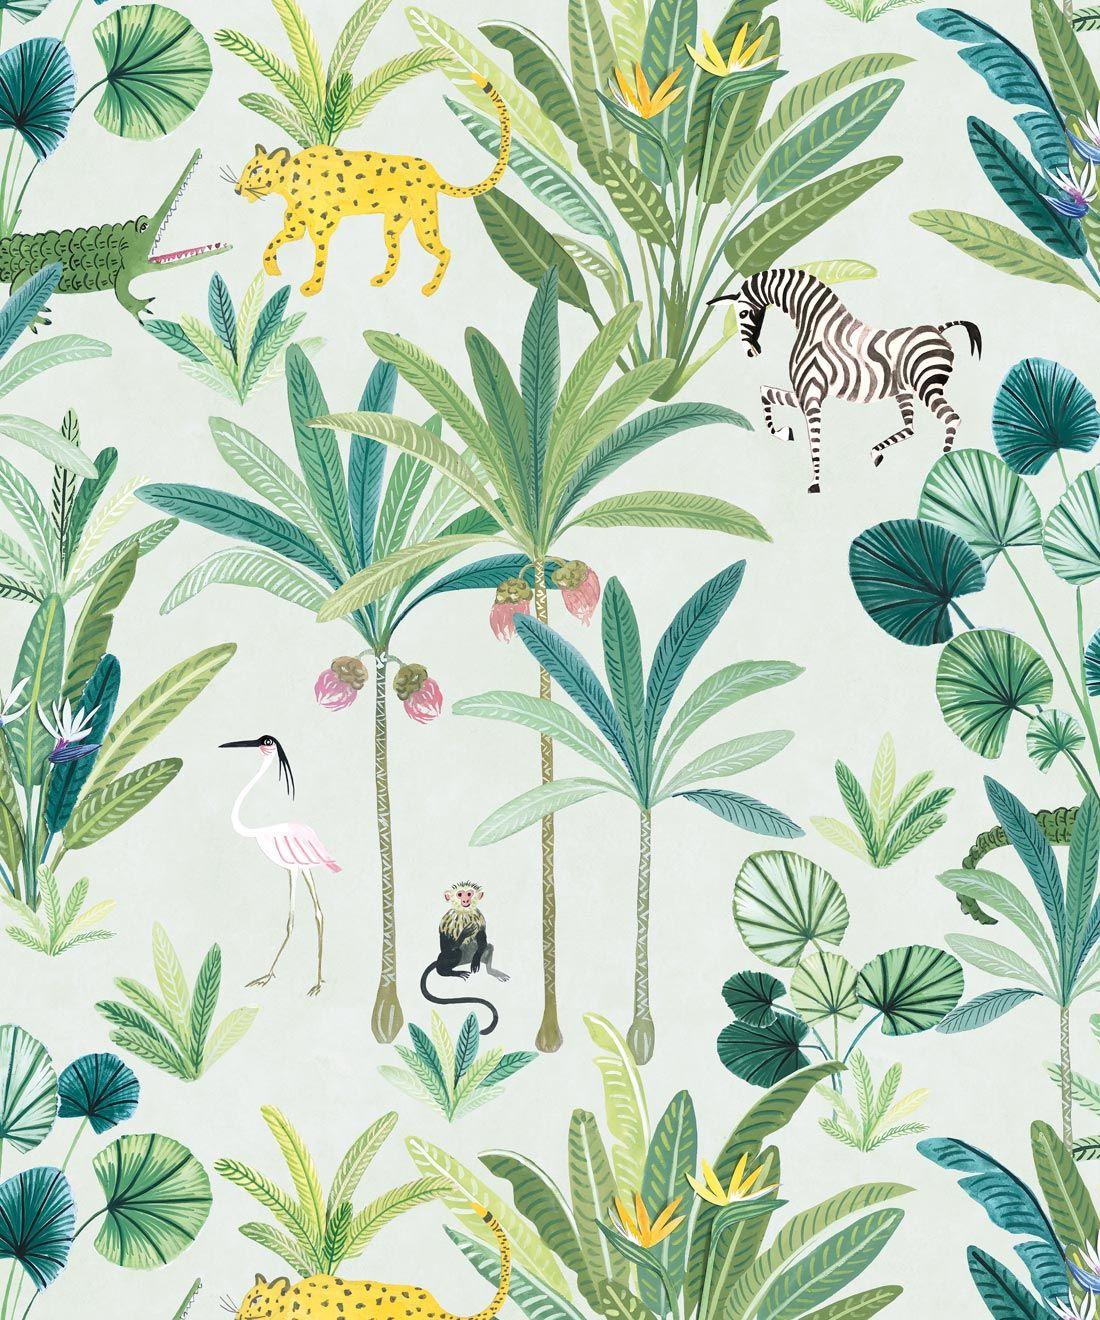 Jungle Wallpaper Gorgeous Animal Kingdom Milton King In 2020 Jungle Wallpaper Monkey Wallpaper Retro Wallpaper